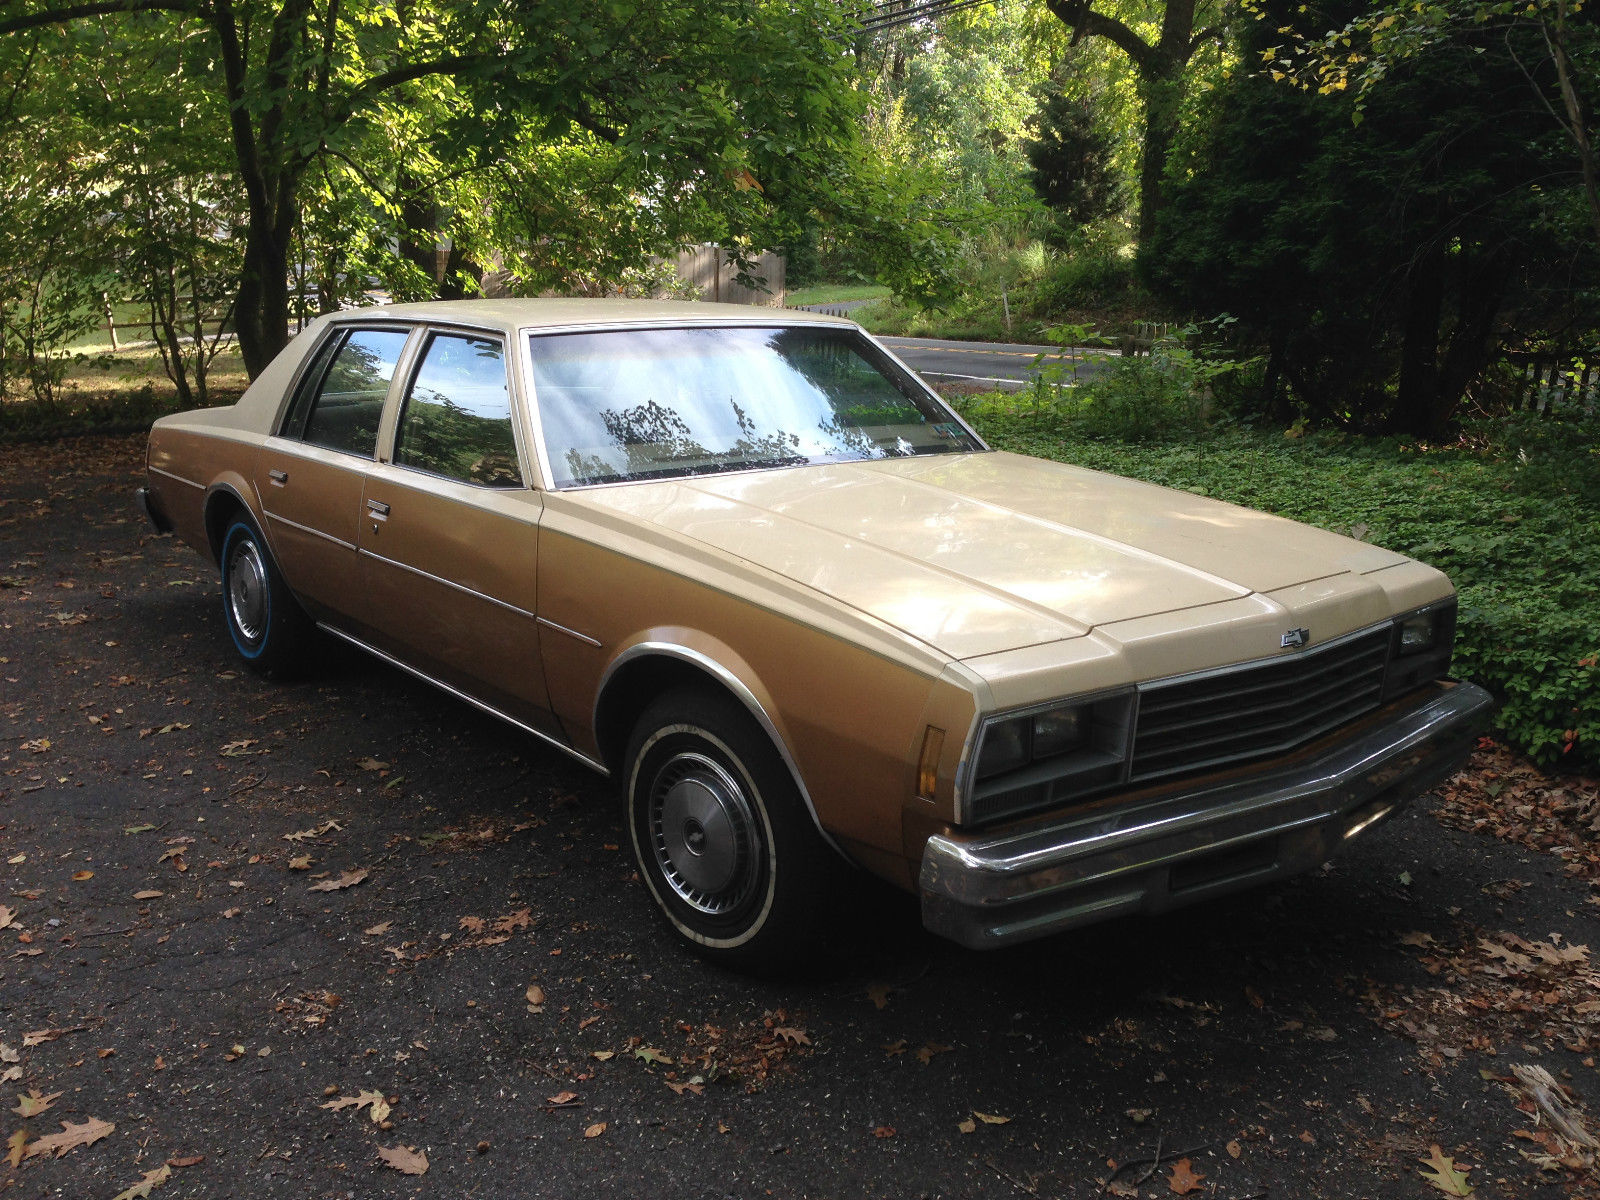 1978 Chevrolet Impala - Overview - CarGurus